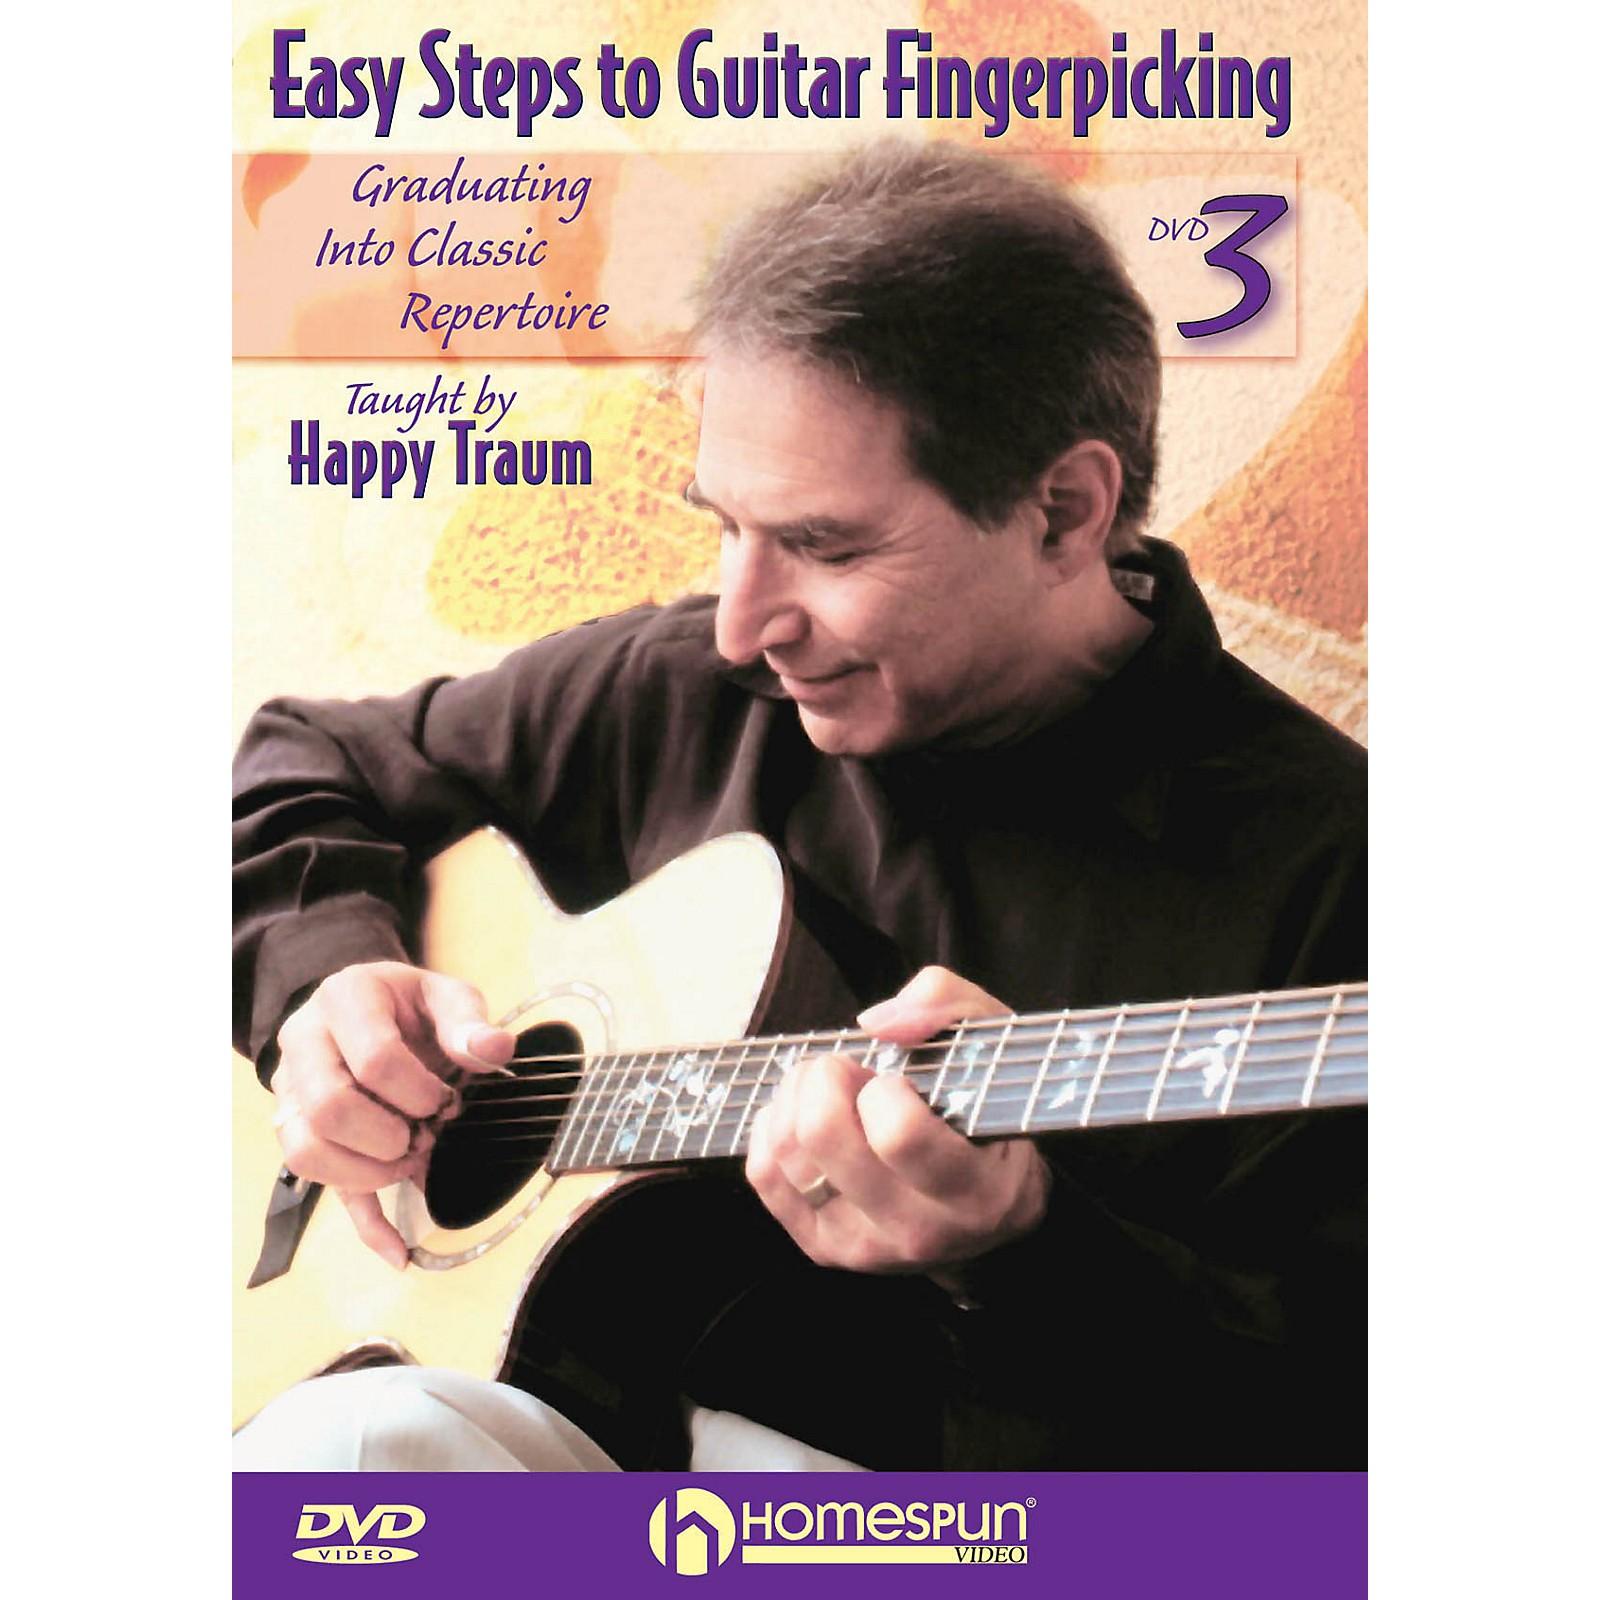 Homespun Easy Steps to Guitar Fingerpicking Instructional/Guitar/DVD Series DVD Written by Happy Traum